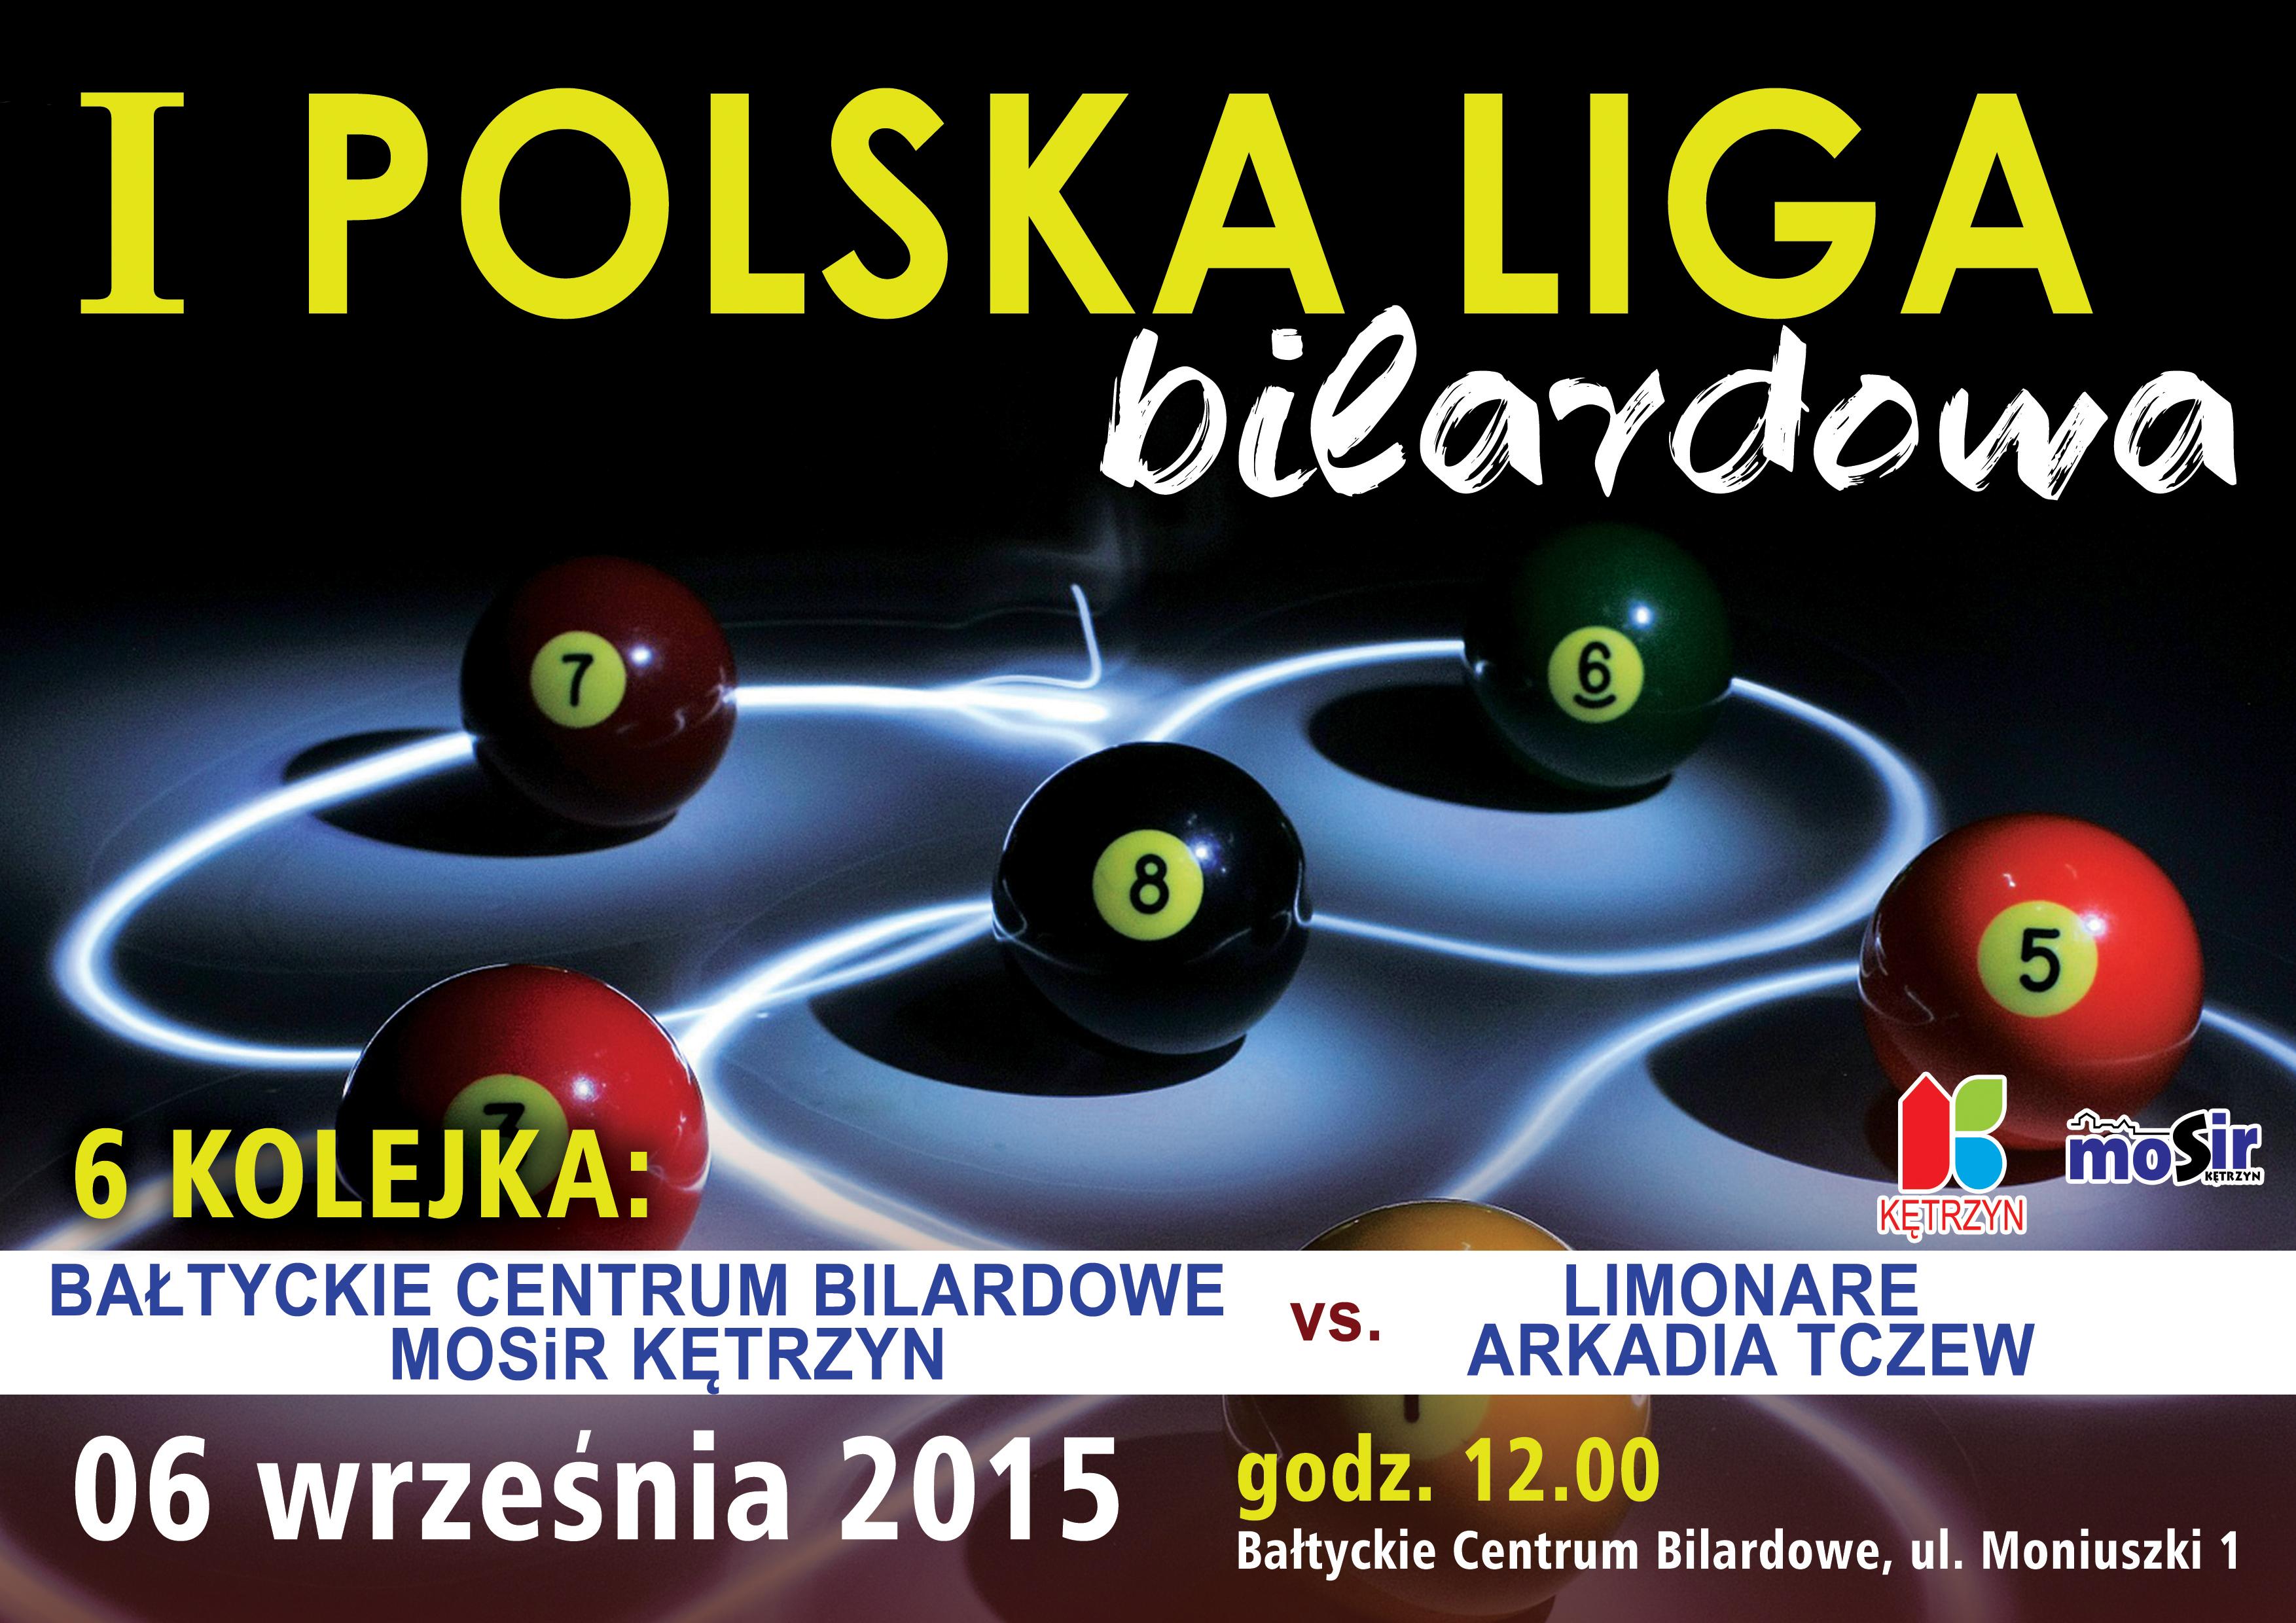 1 polska liga